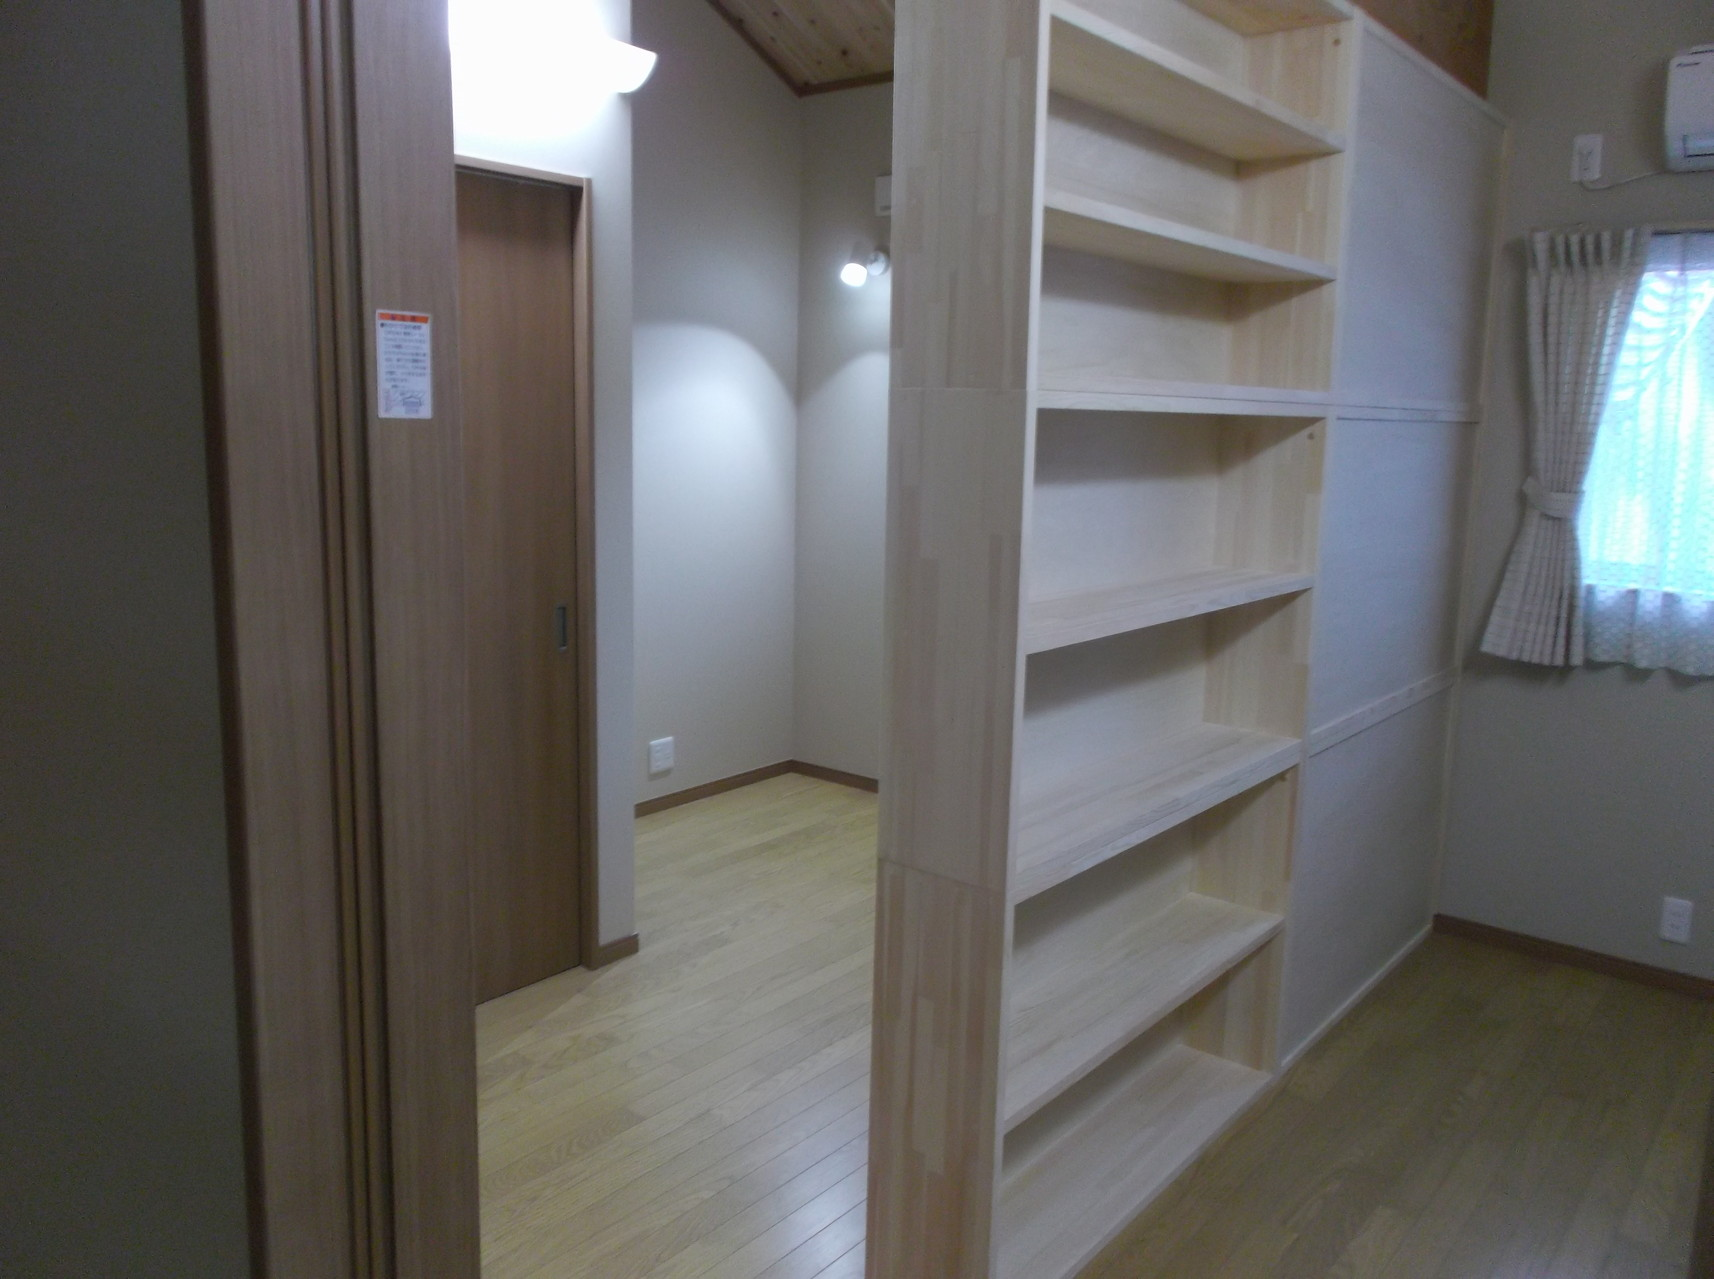 子供部屋を仕切る可動式収納棚